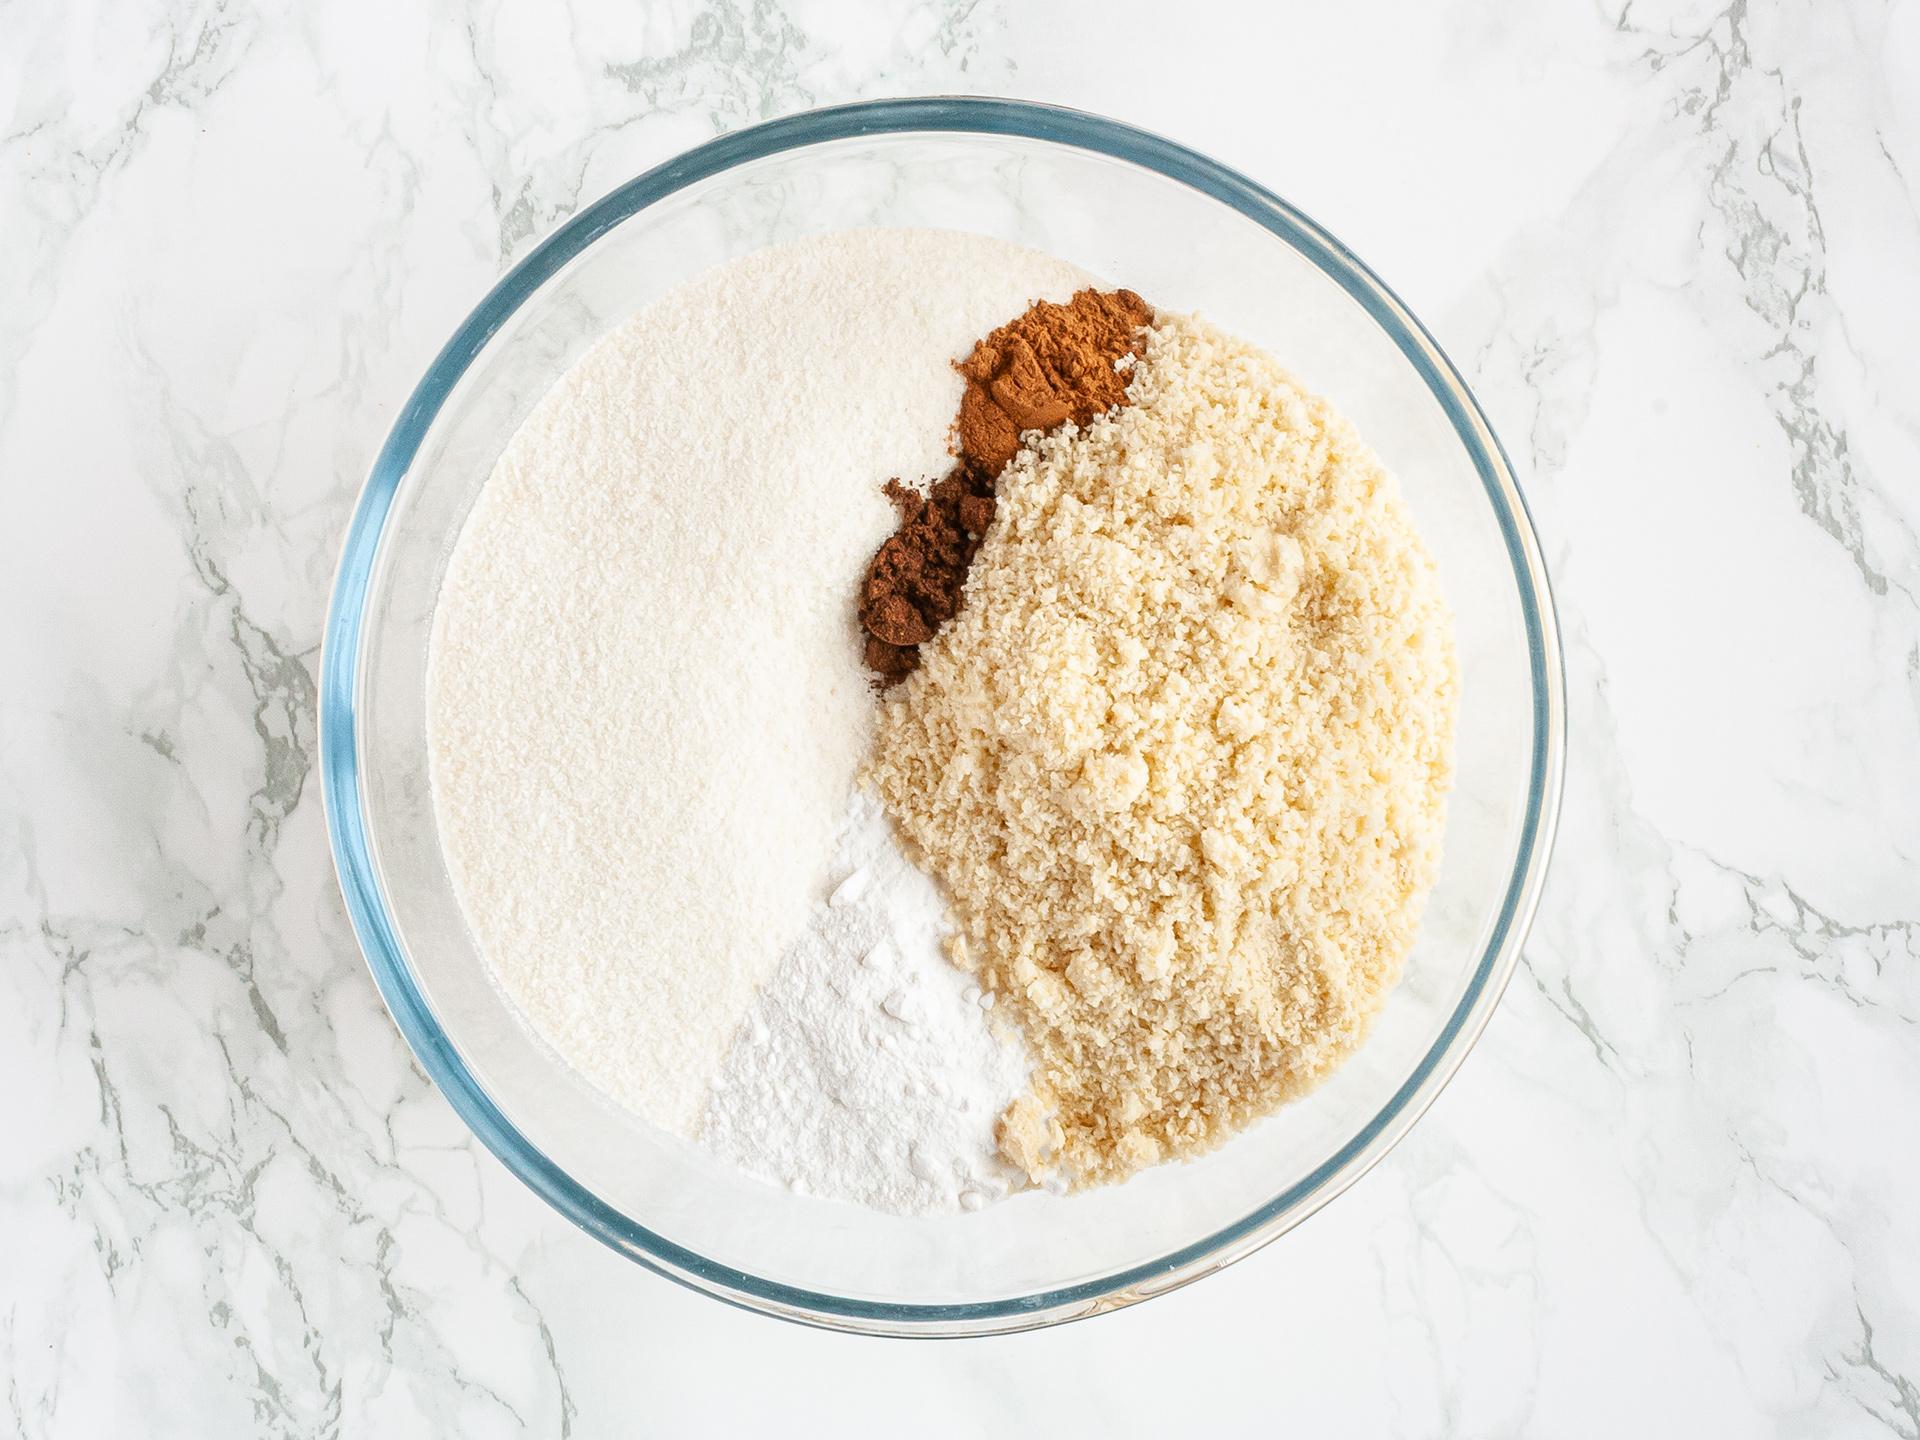 Step 2.1 of Gluten Free Apple Cake Recipe